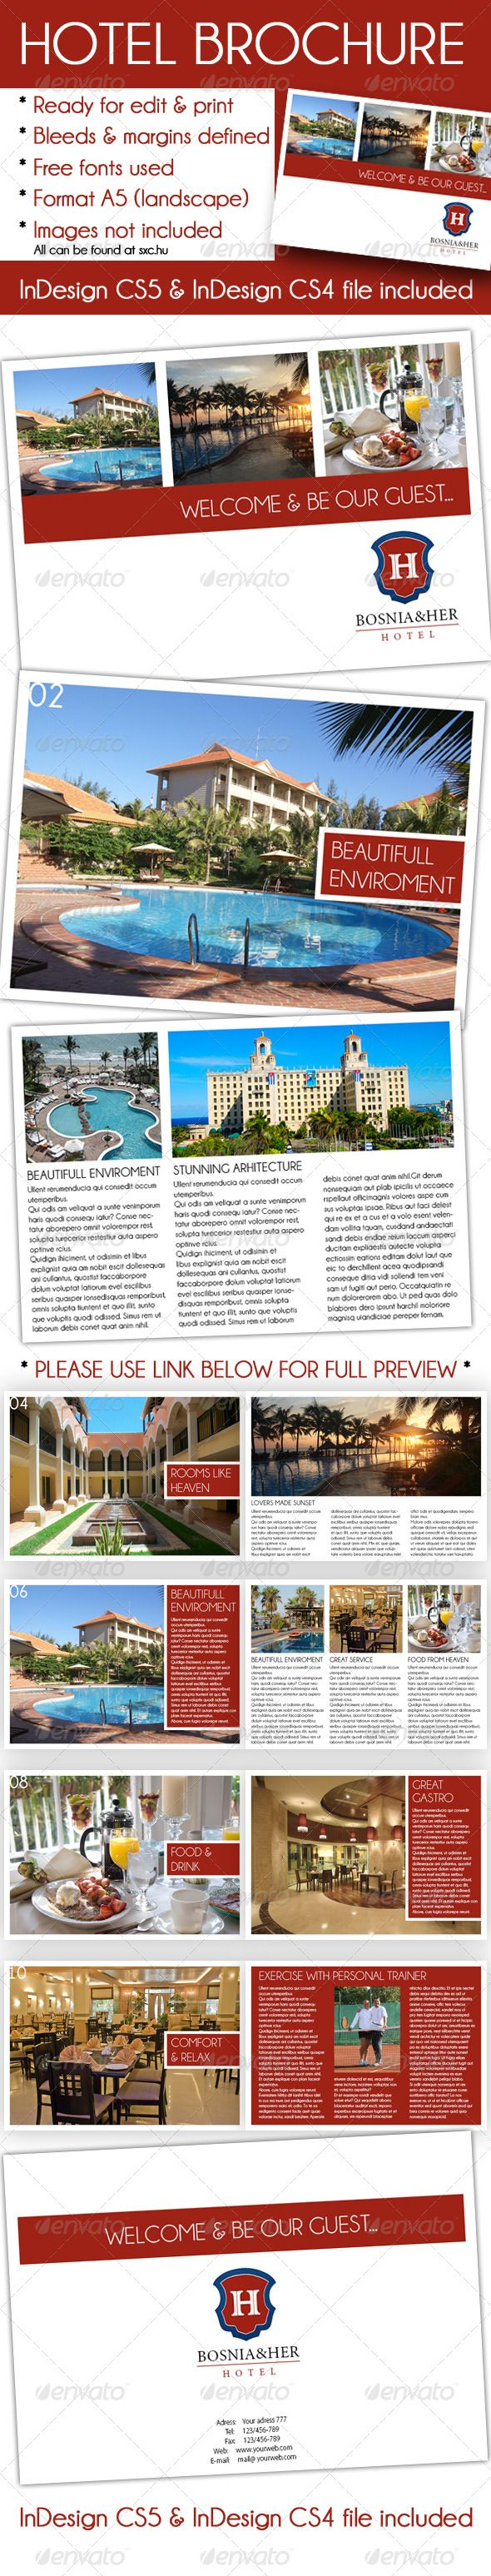 a5 landscape brochure template - elegant hotel brochure a5 indesign template restaurant